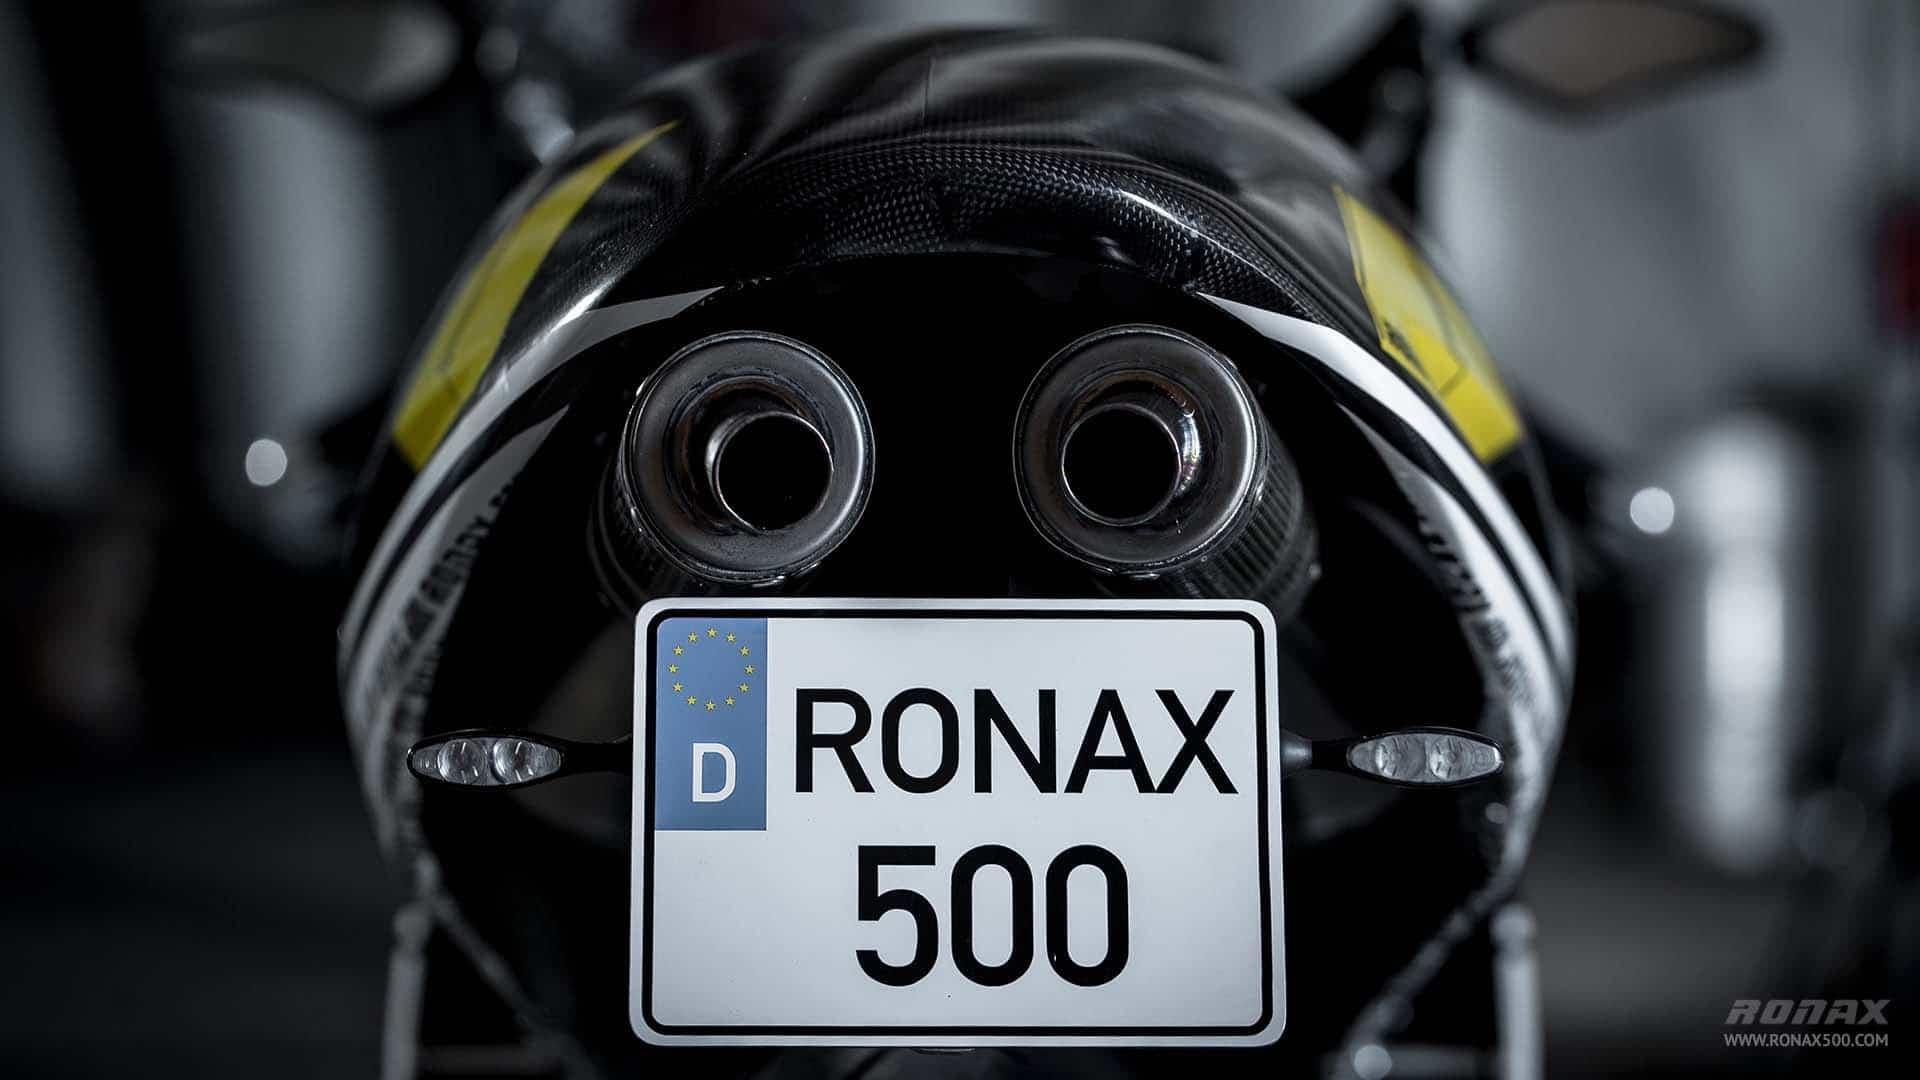 Ronax-500-Motorbike 16